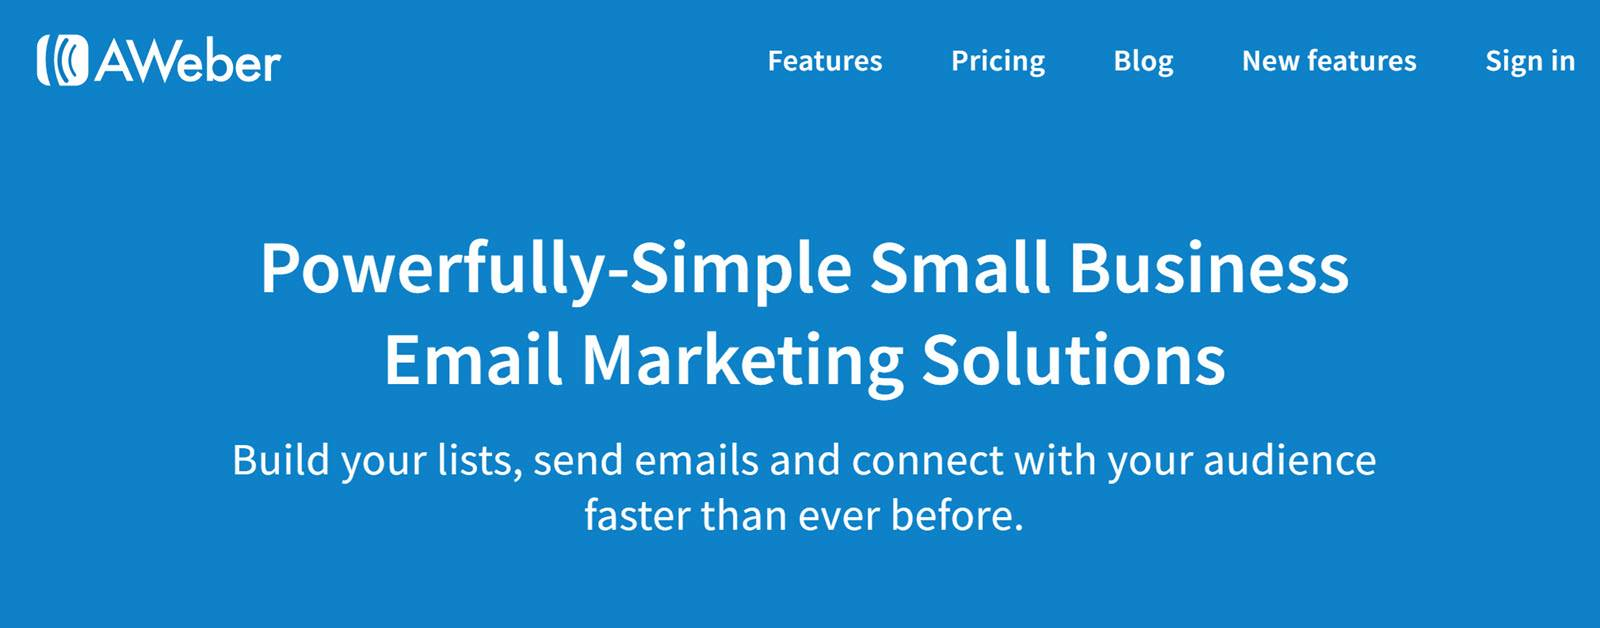 Best CRM Email Marketing Automation Platform - Aweber